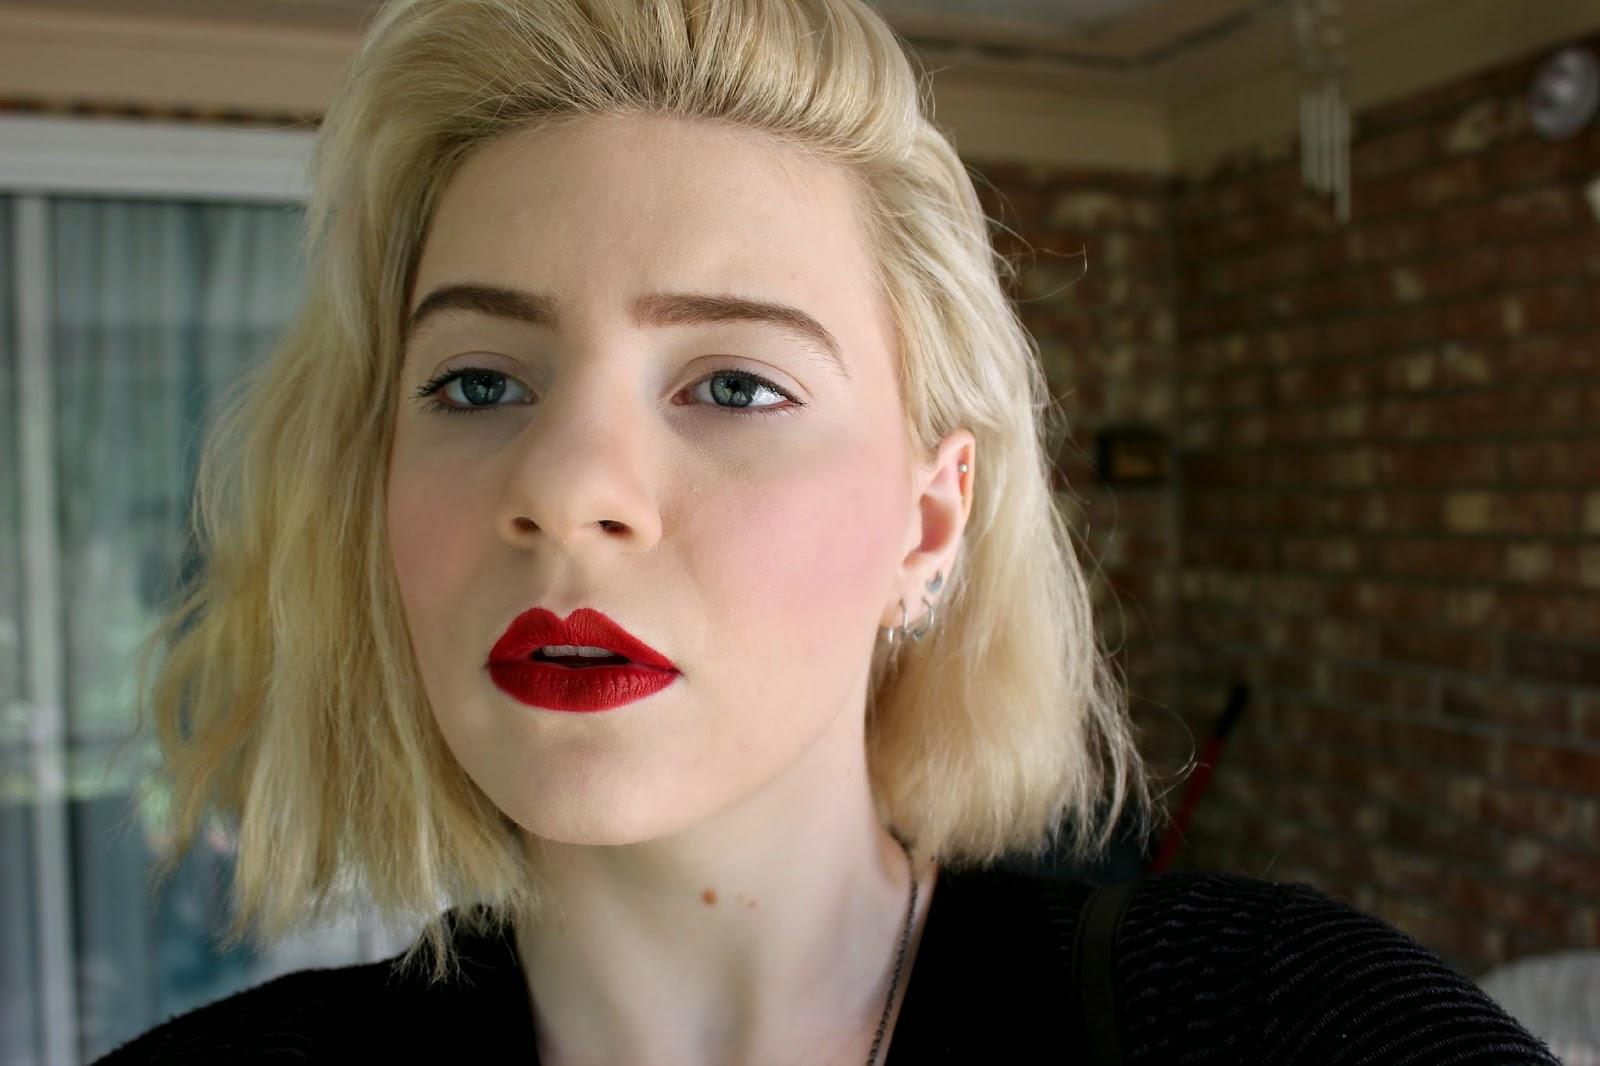 AitU♔: Minimal/French-Inspired Makeup Look